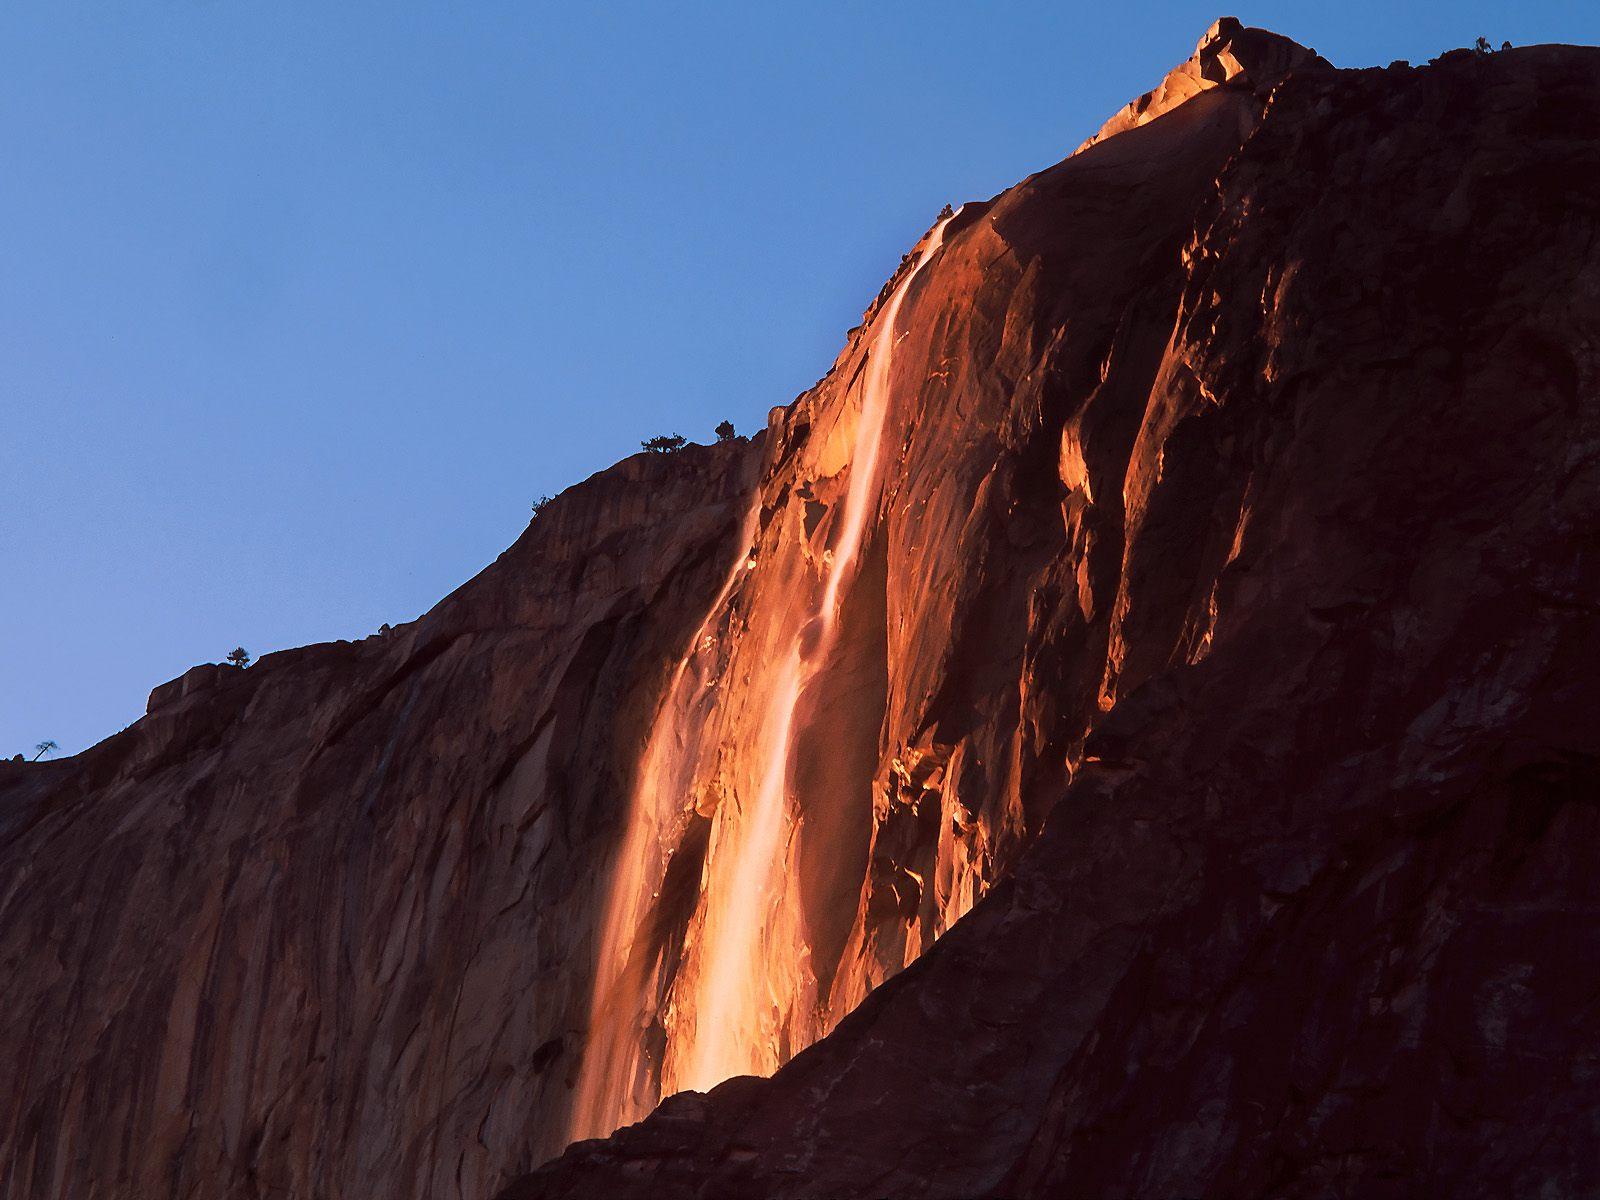 Last Light Horsetail Falls Yosemite National Park California